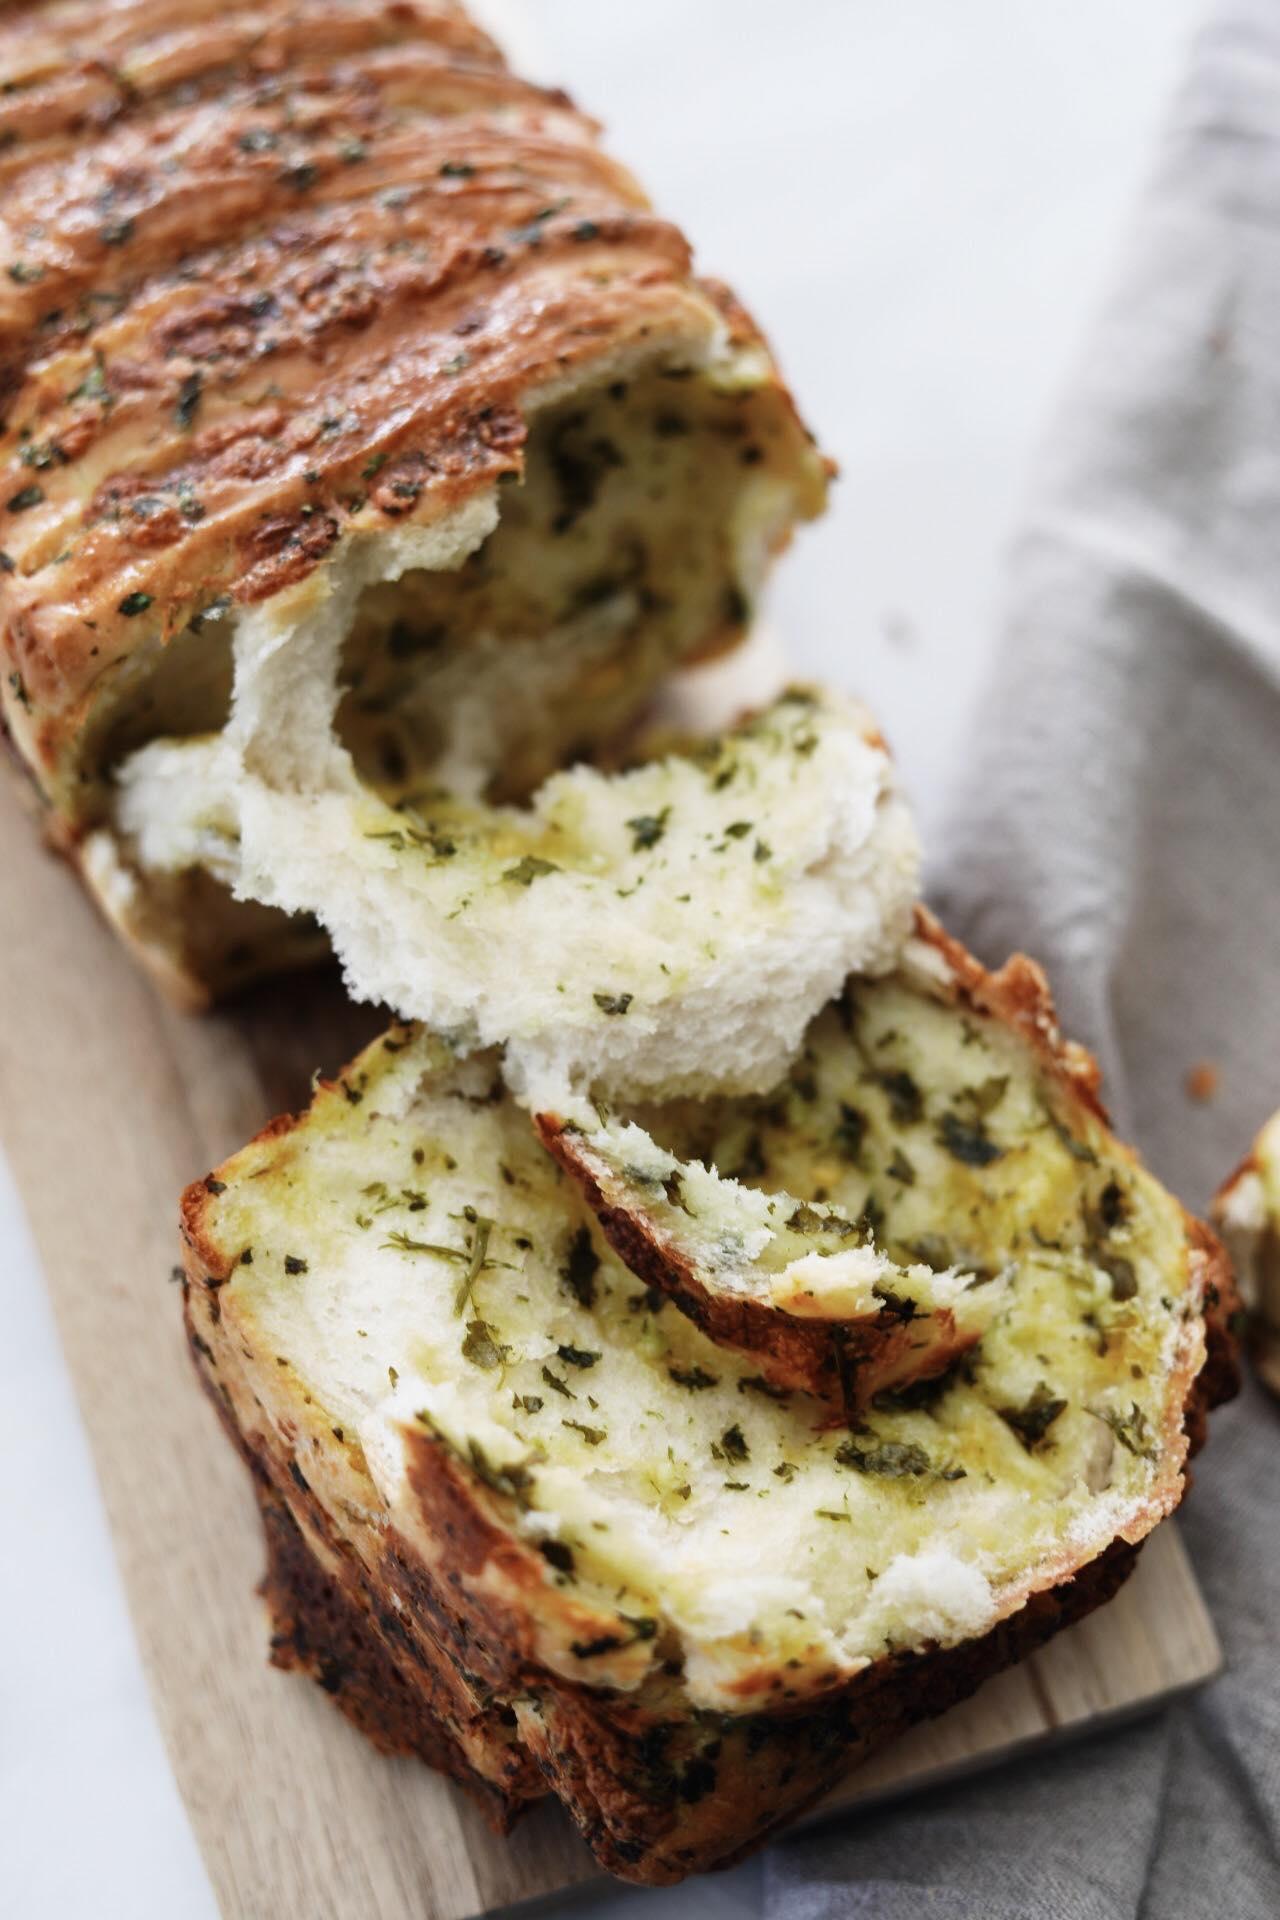 Pull-apart bread med ost, hvidløg og persille